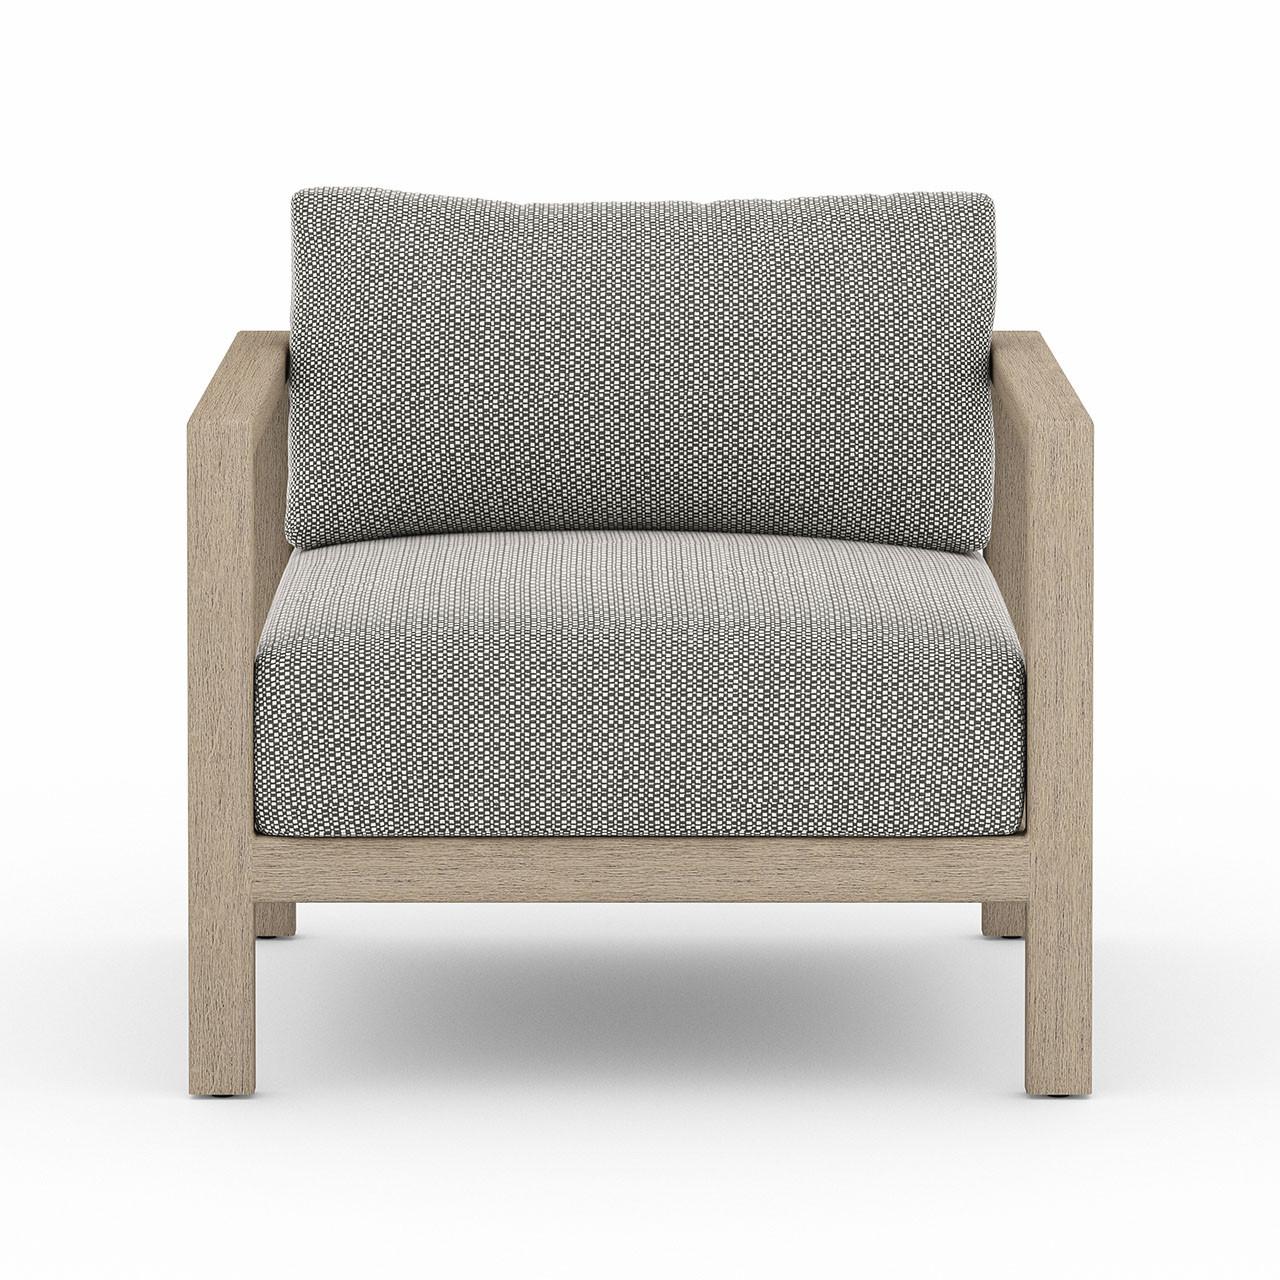 Oceanside Outdoor Teak Lounge Chair - Washed Brown